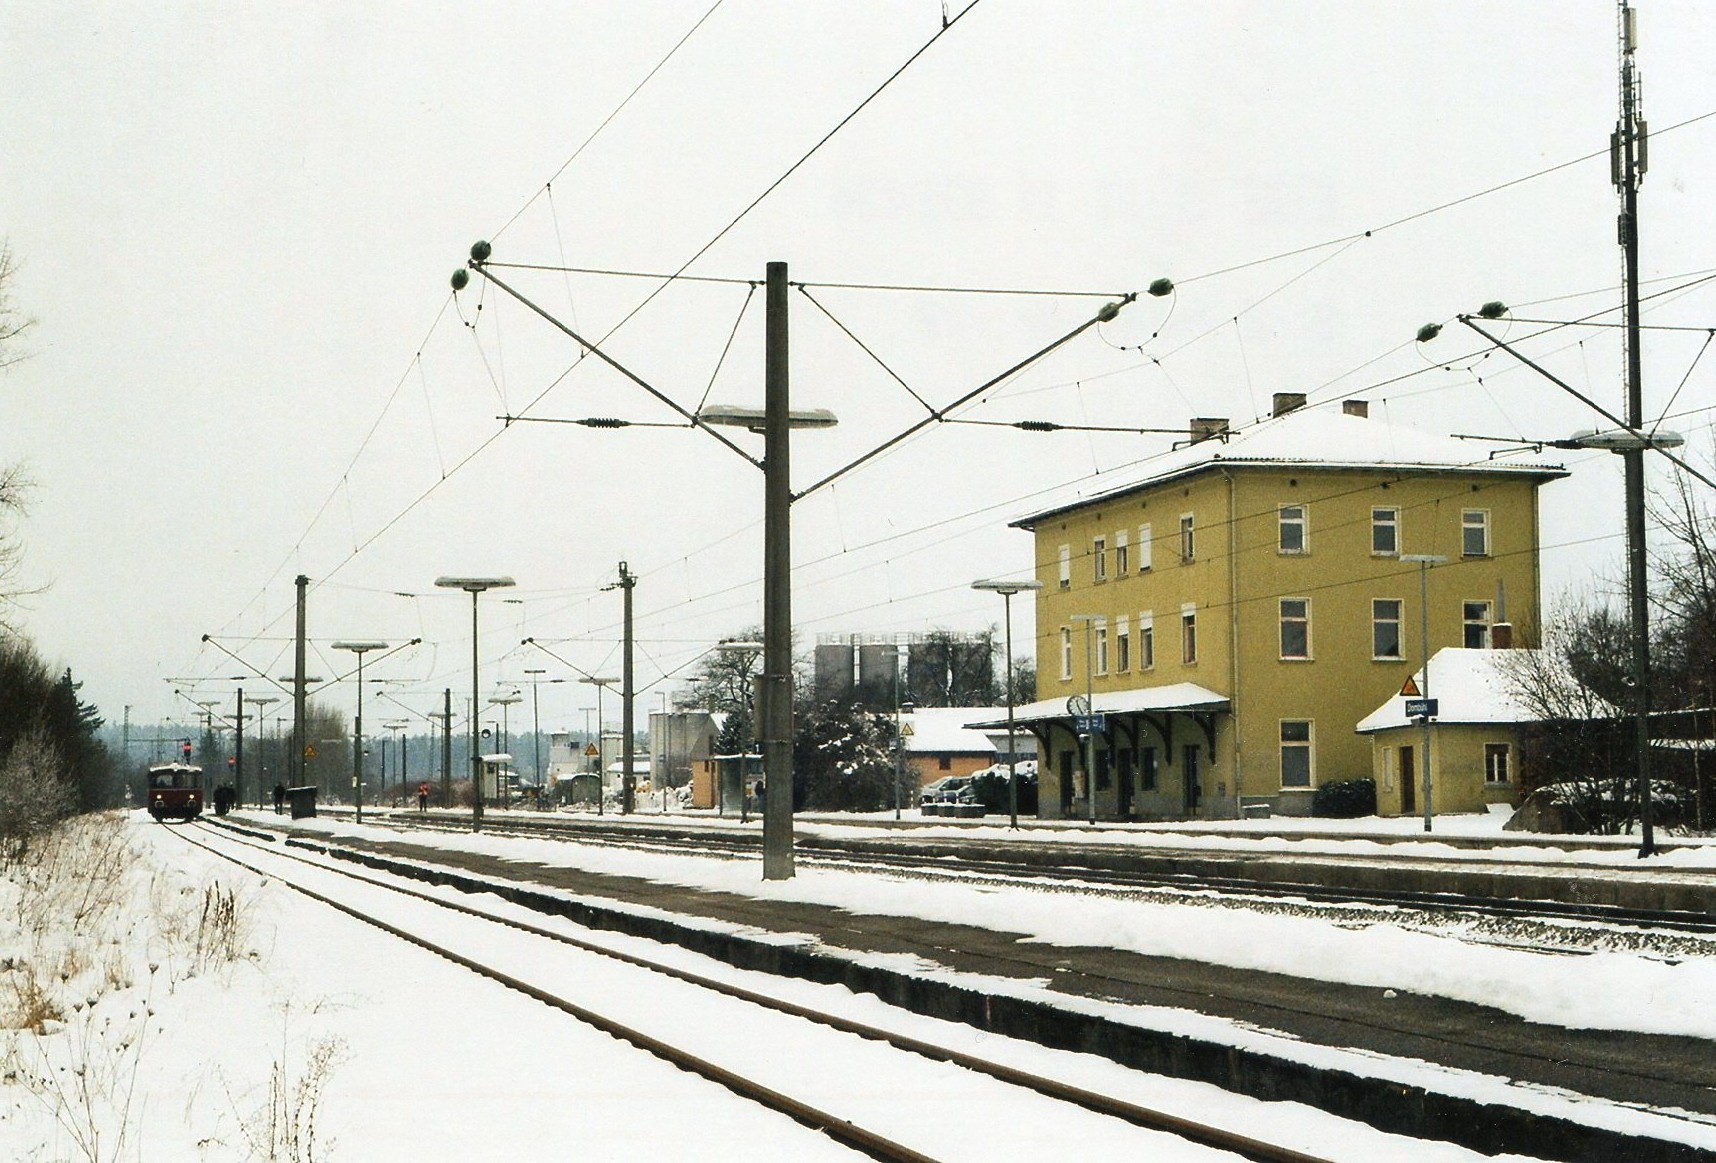 Dombühl 5.12.2010